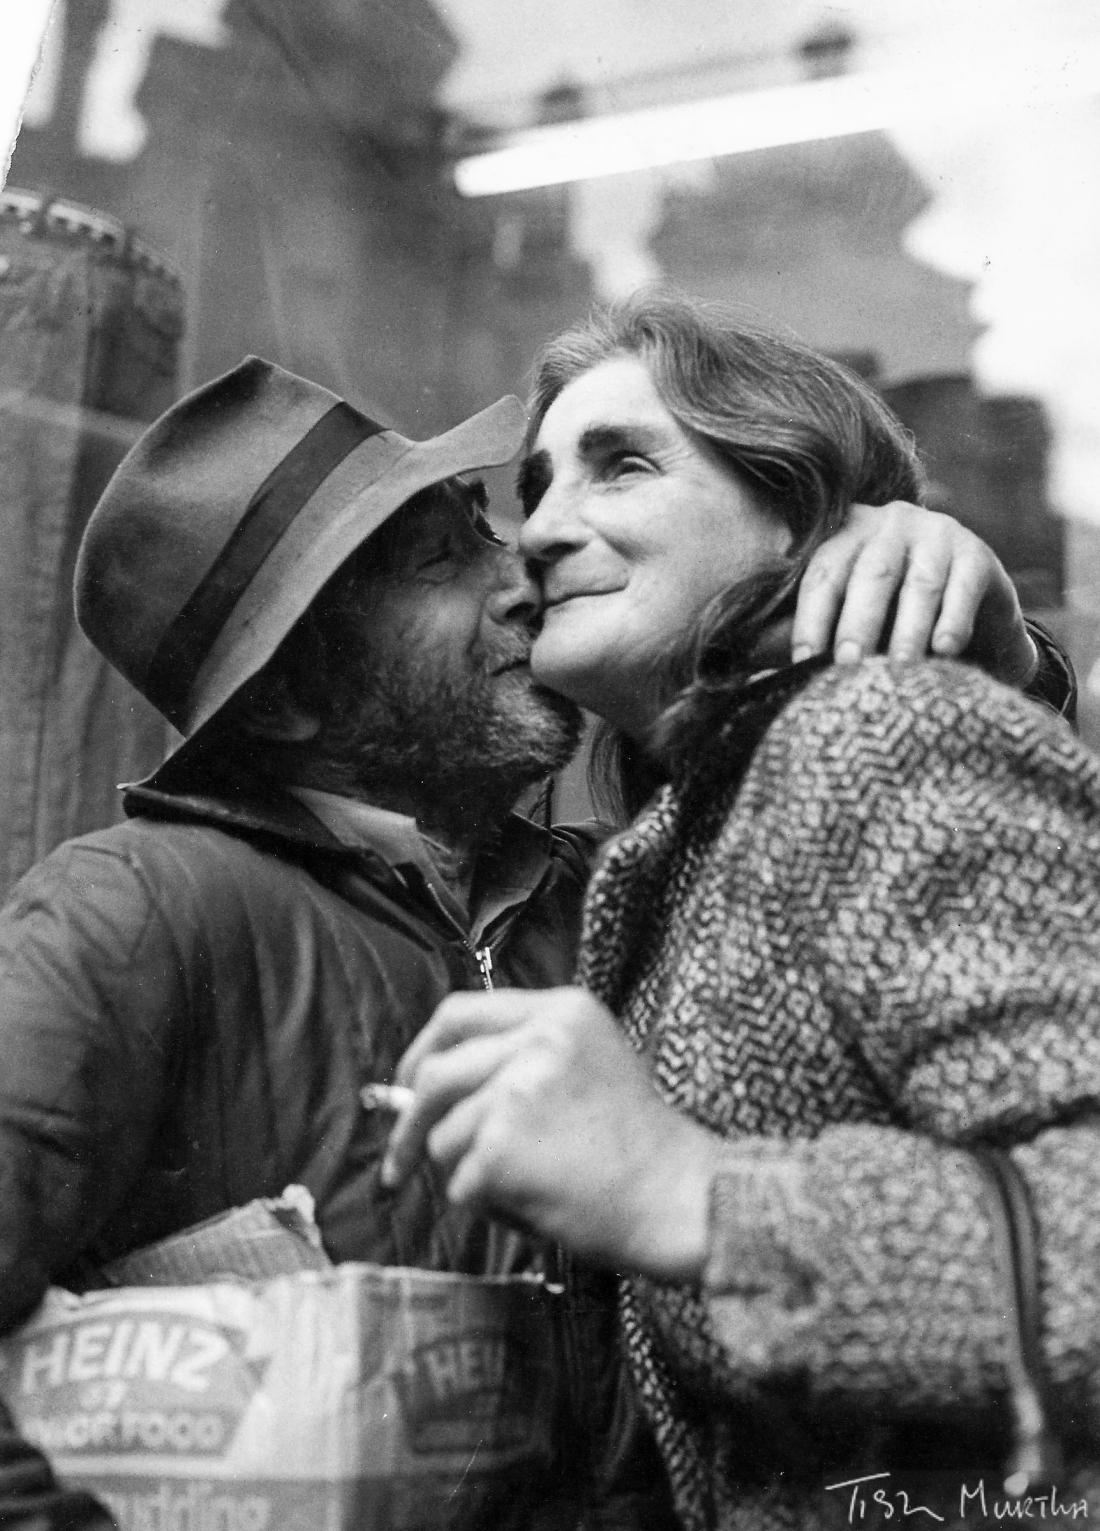 Tish Murtha Newport – Angela and Starky, 1976 © Ella Murtha, All rights reserved. Courtesy of Ella Murtha & The Photographers' Gallery